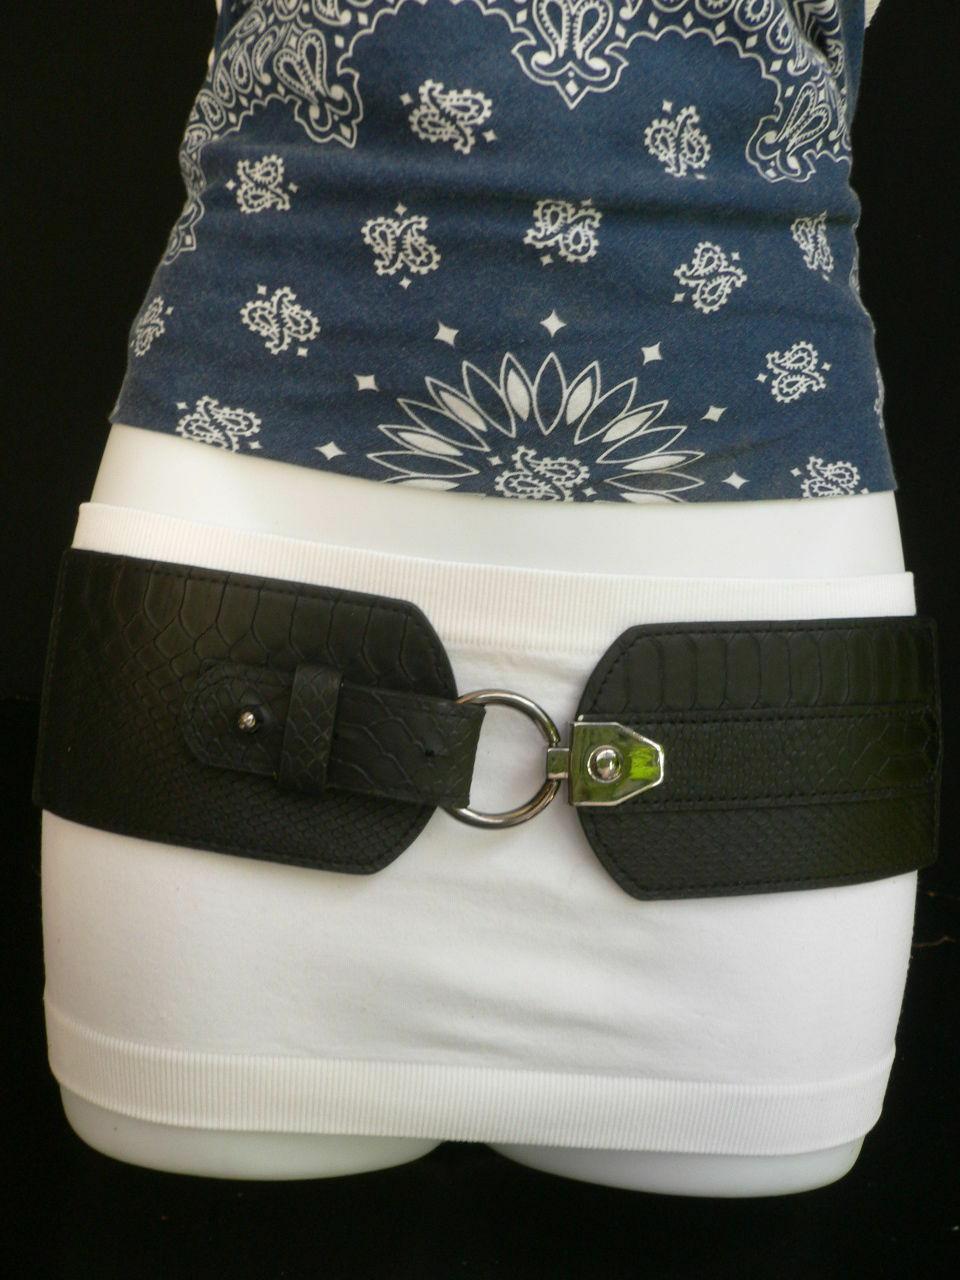 Cintura Donna Fashion Hip Vita Elastico Nero Largo Finta pelle Serpente Timbro image 2